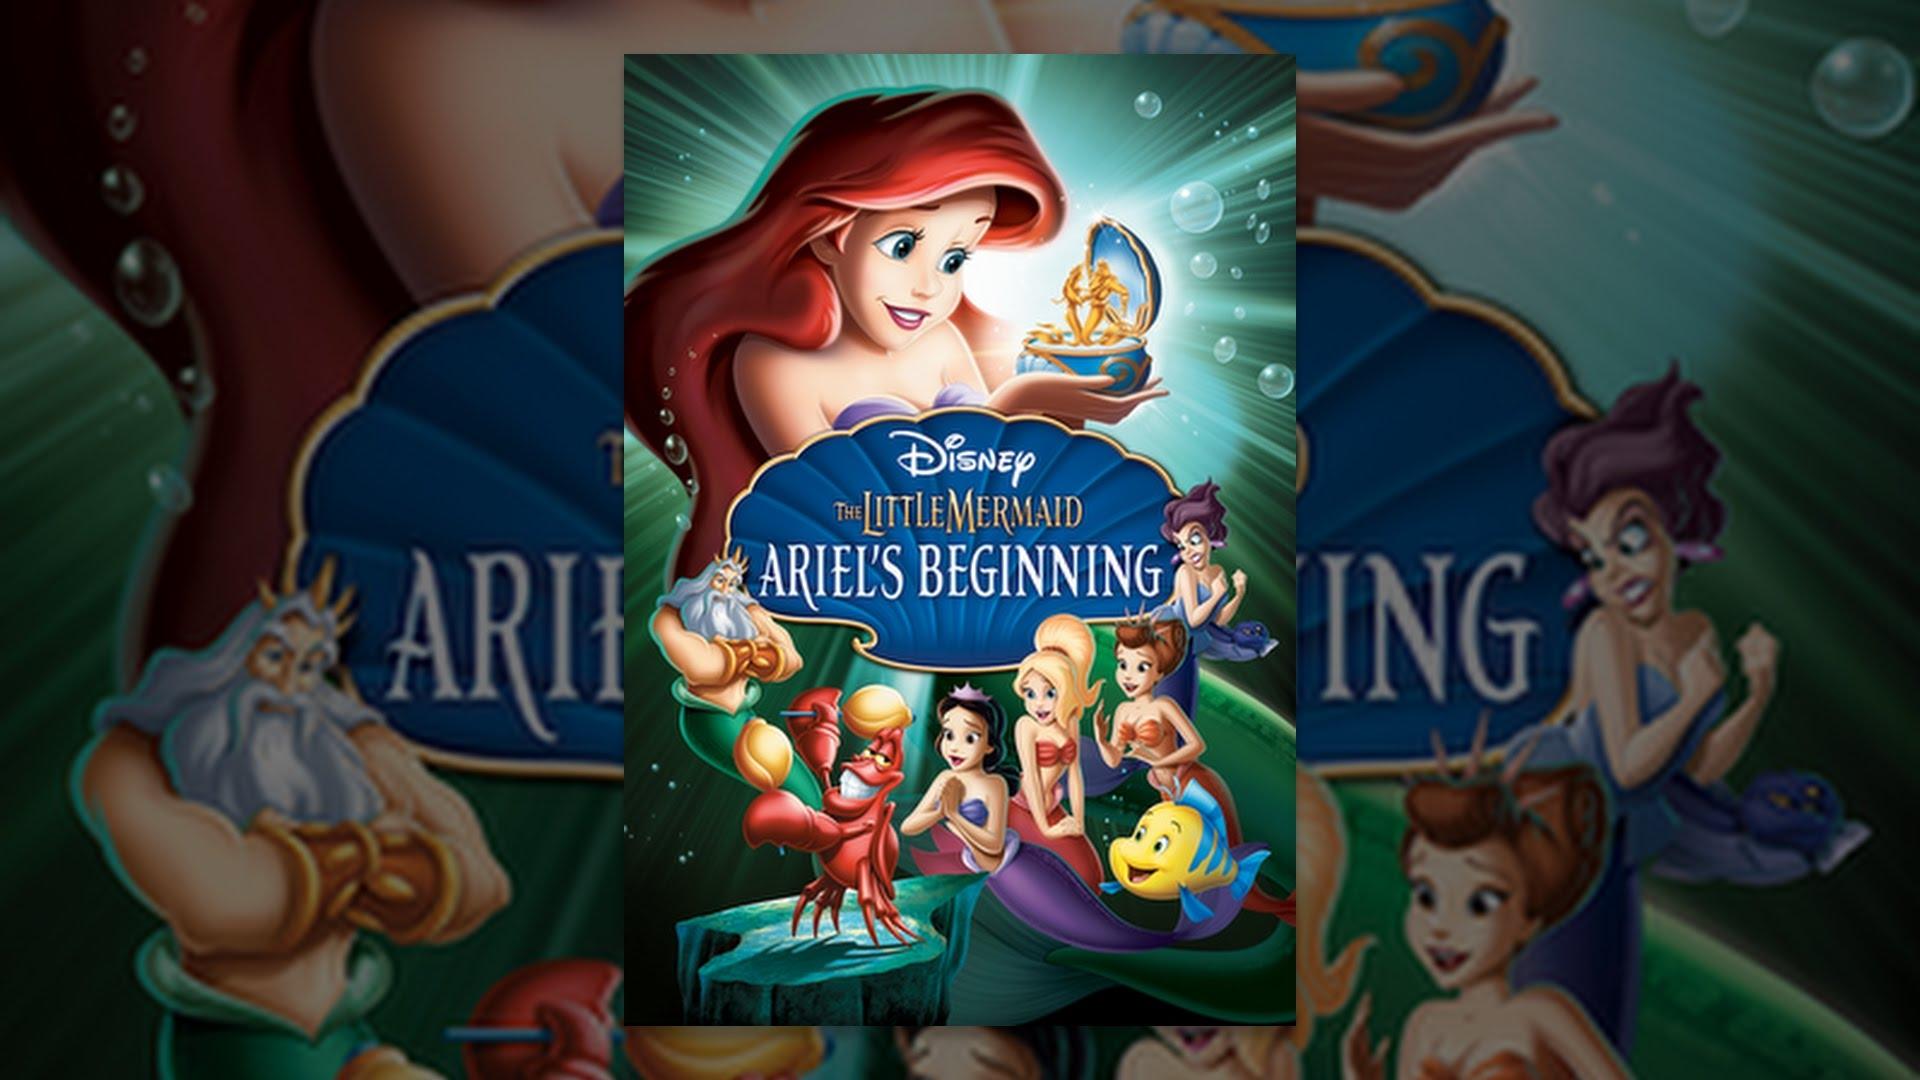 Download The Little Mermaid: Ariel's Beginning